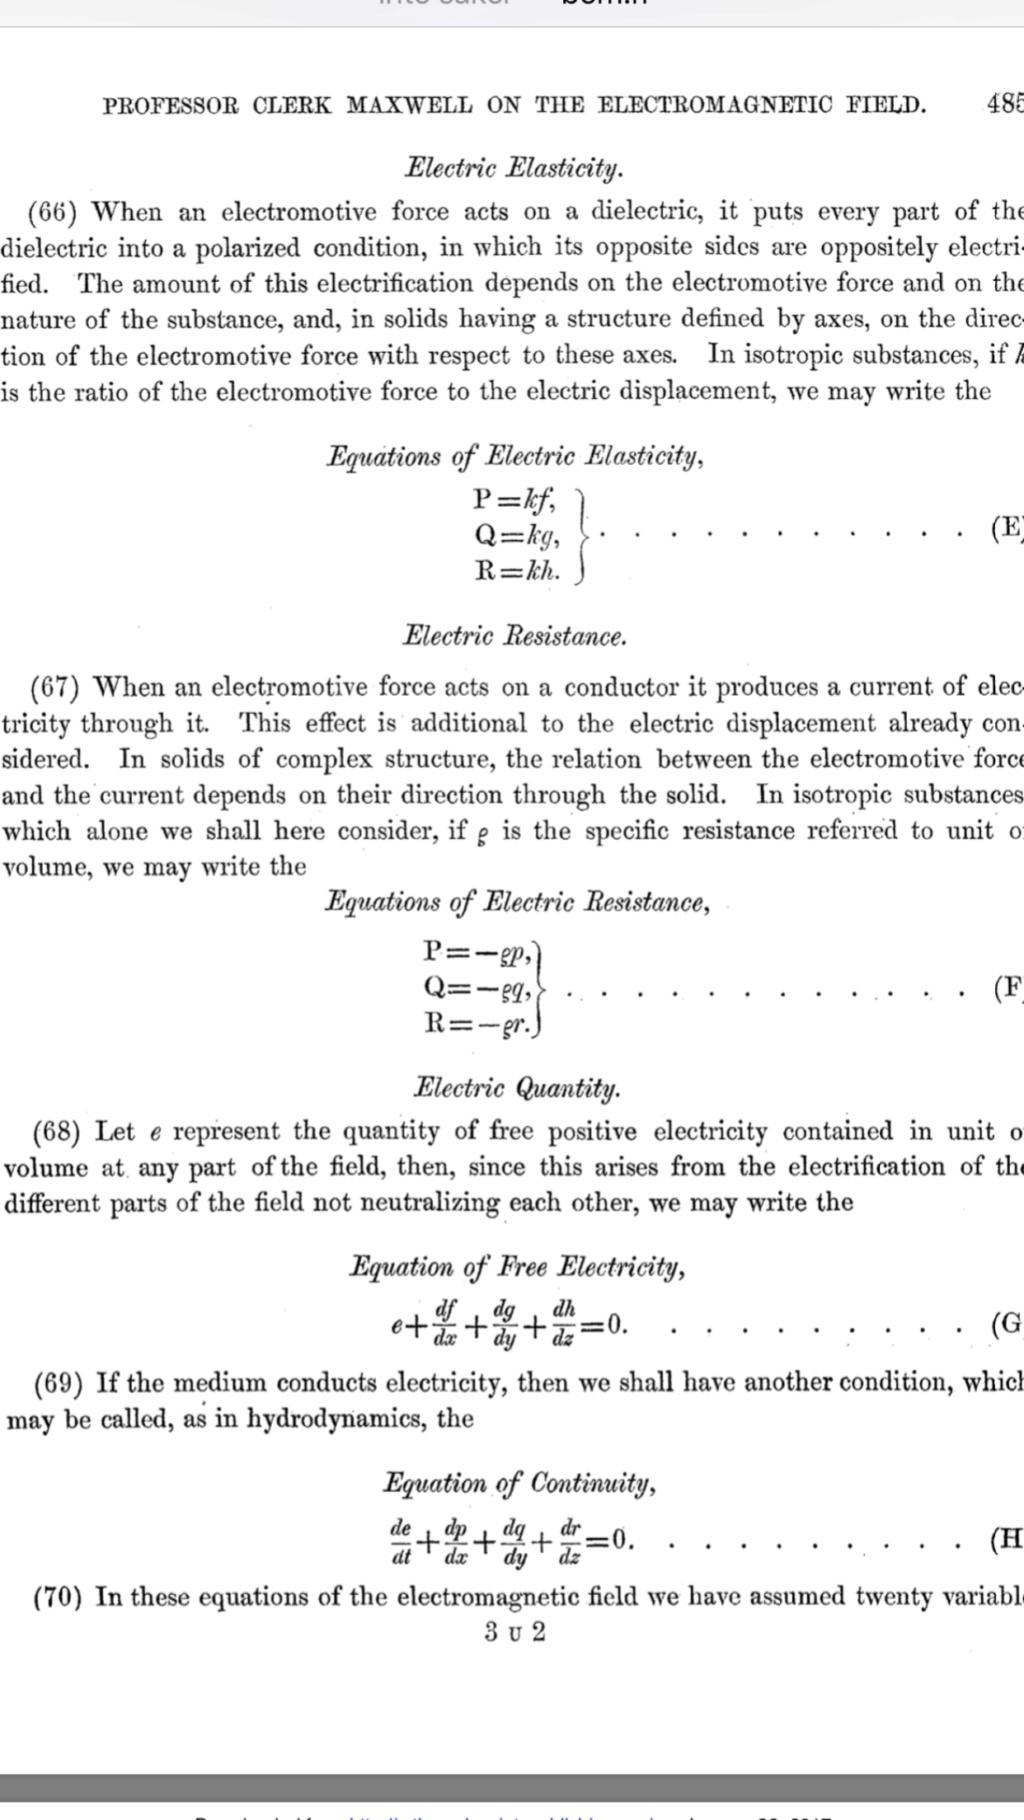 Maxwell - Despre ecuaţiile lui Maxwell - Pagina 11 F7a2ae10